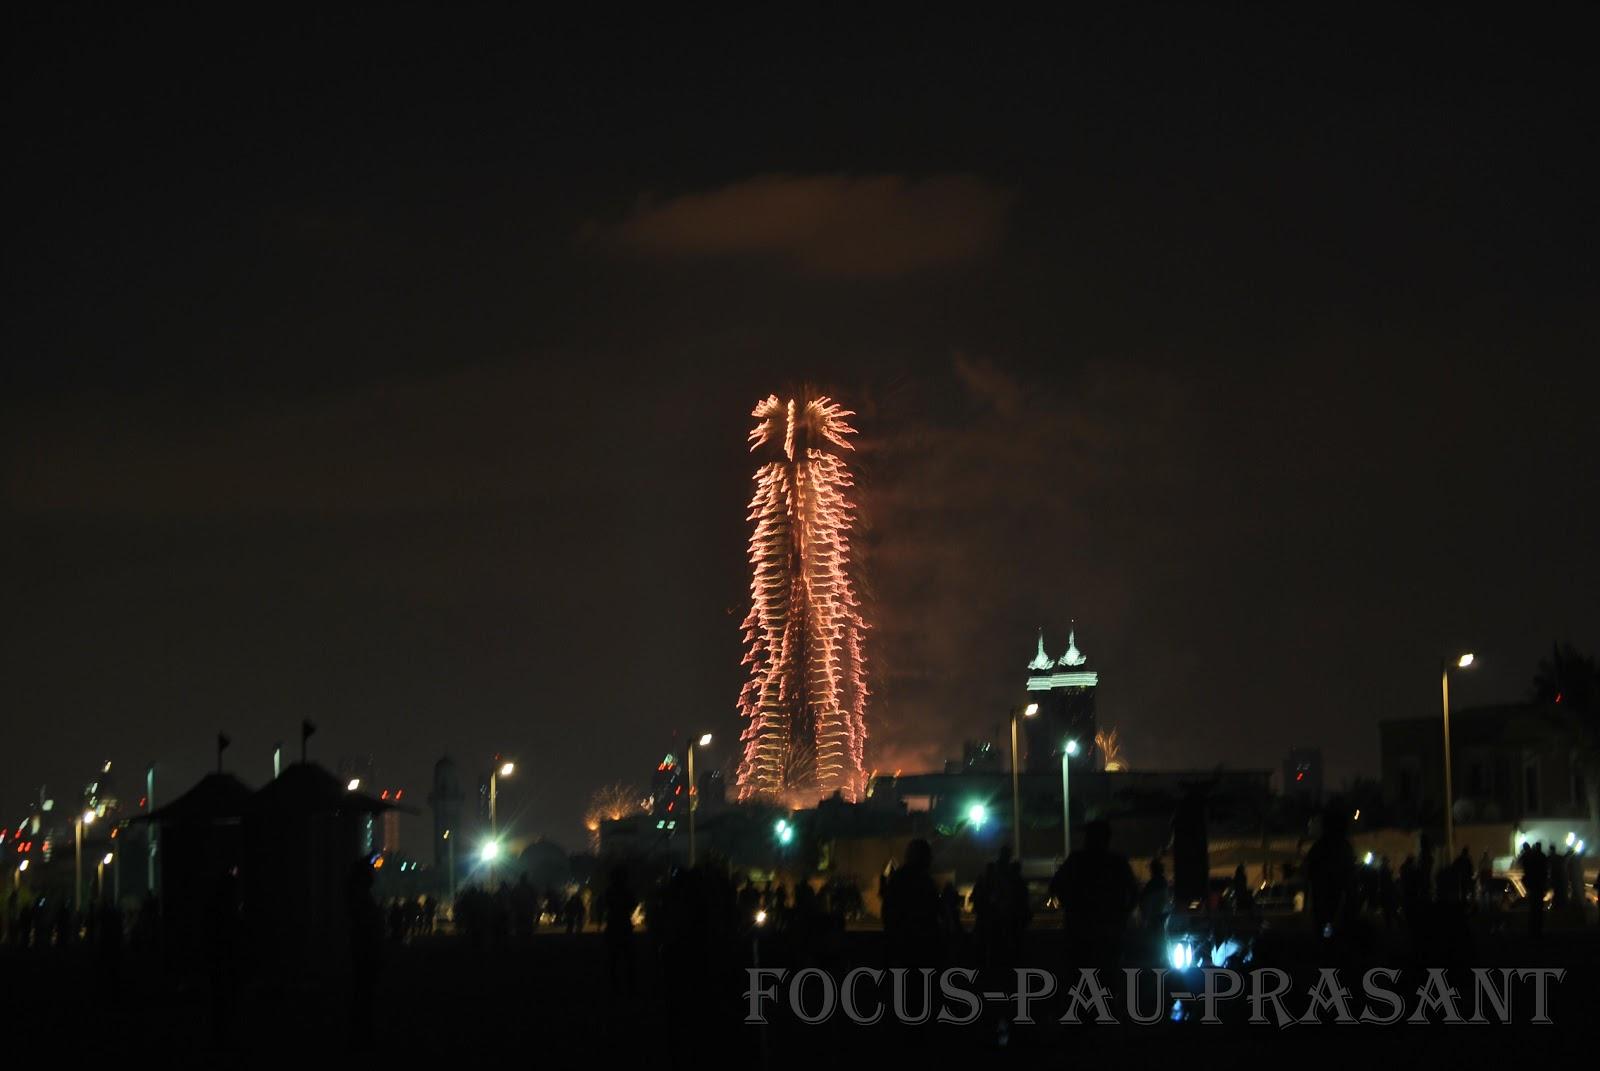 Prasantmenon New Year Fire Work Burj Khalifa And Burj Al Arab